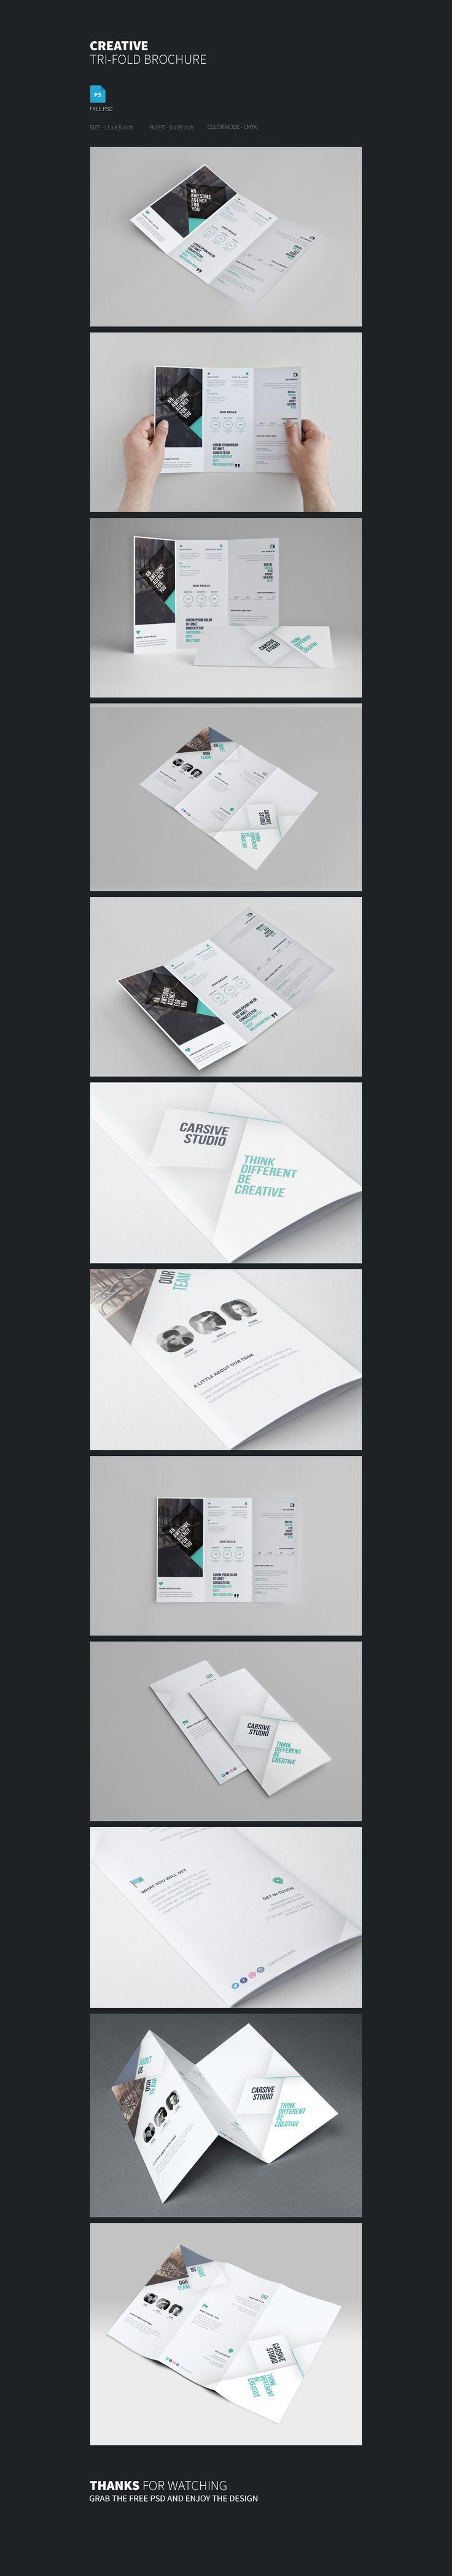 Tri fold Brochure Template Freebie on Behance